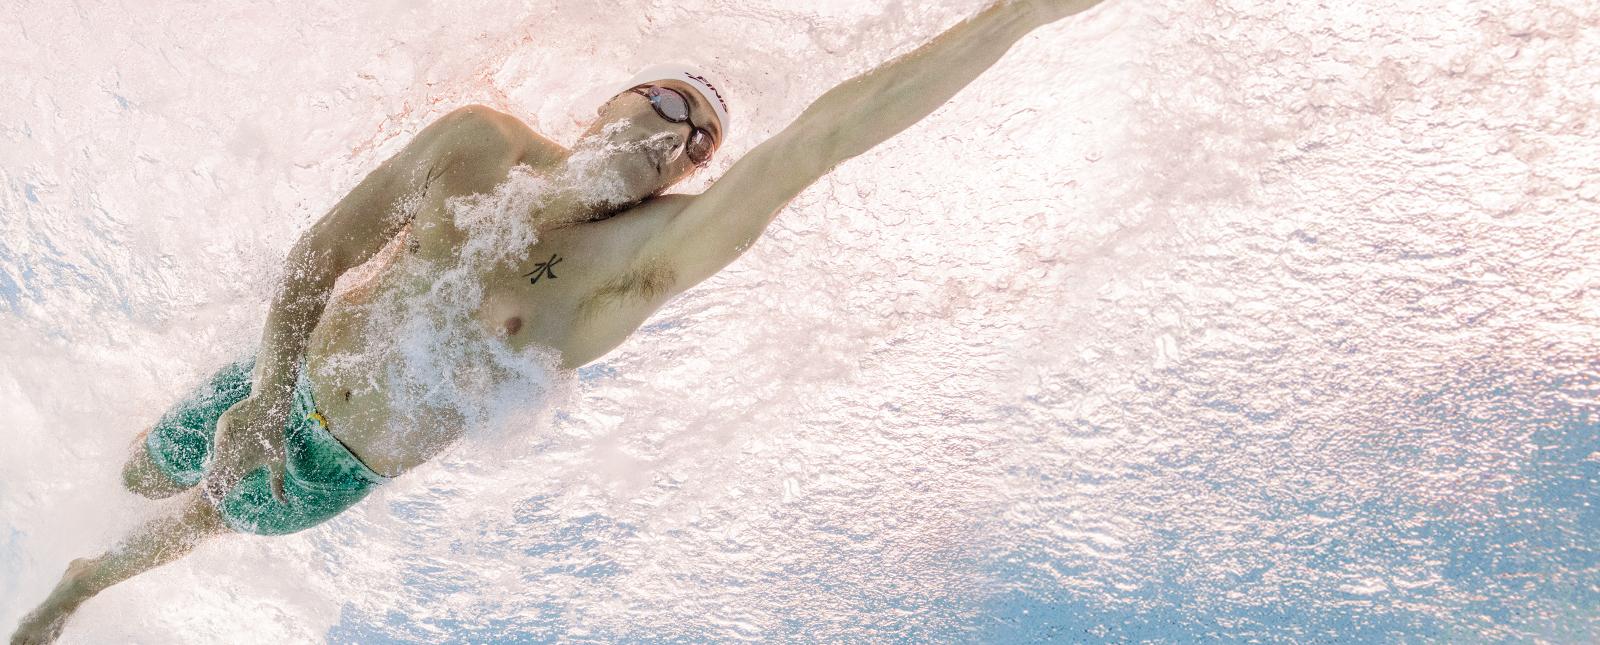 Costume gara nuoto uomo Finis ONYX Jammer